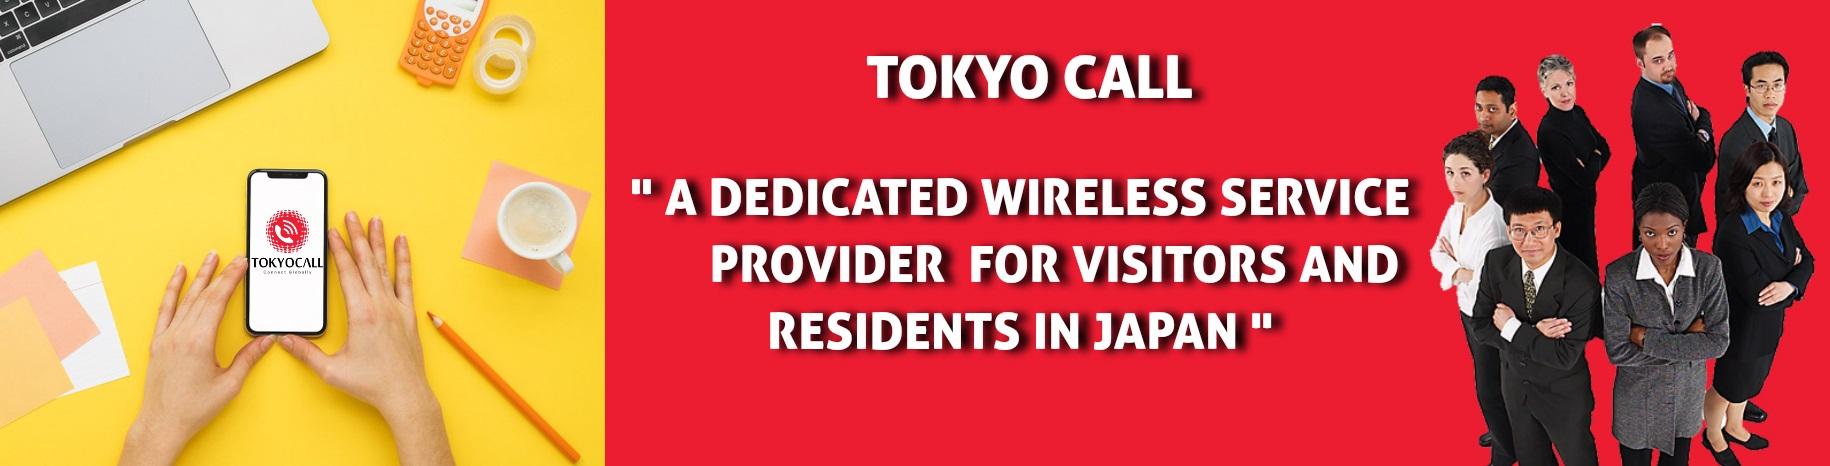 TOKYO CALL